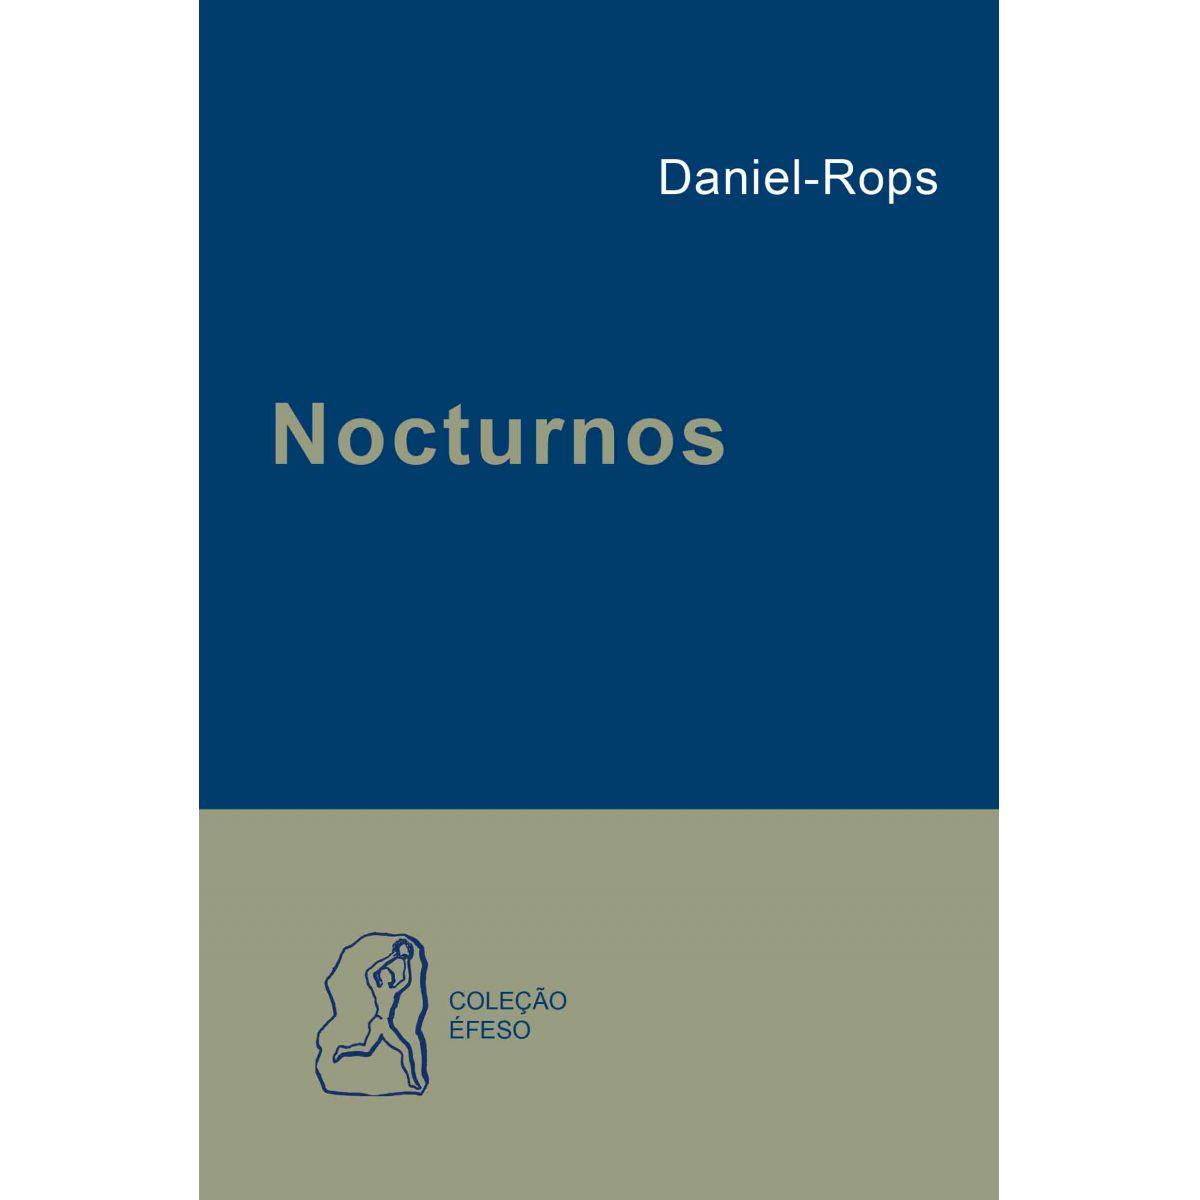 Nocturnos - Daniel-Rops